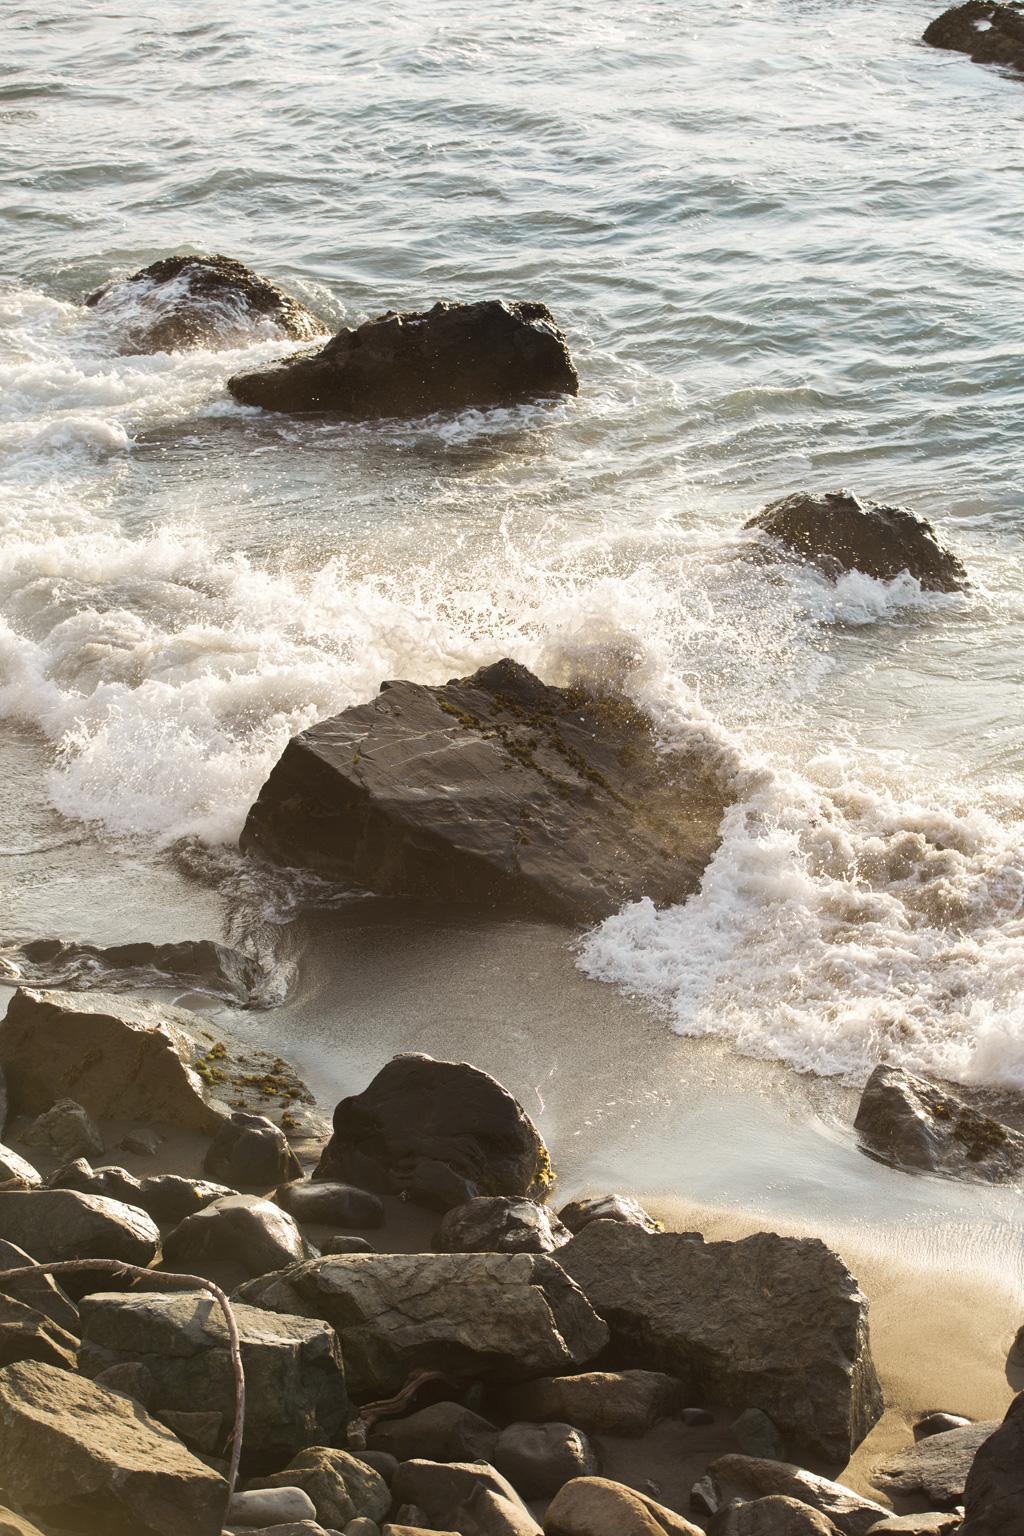 CindyGiovagnoli_Crater_Lake_National_Park_Cape_Perpetua_Heceta_Head_lighthouse_Pacific_Ocean_Cannon_Beach_haystack_Oregon_coast-008.jpg